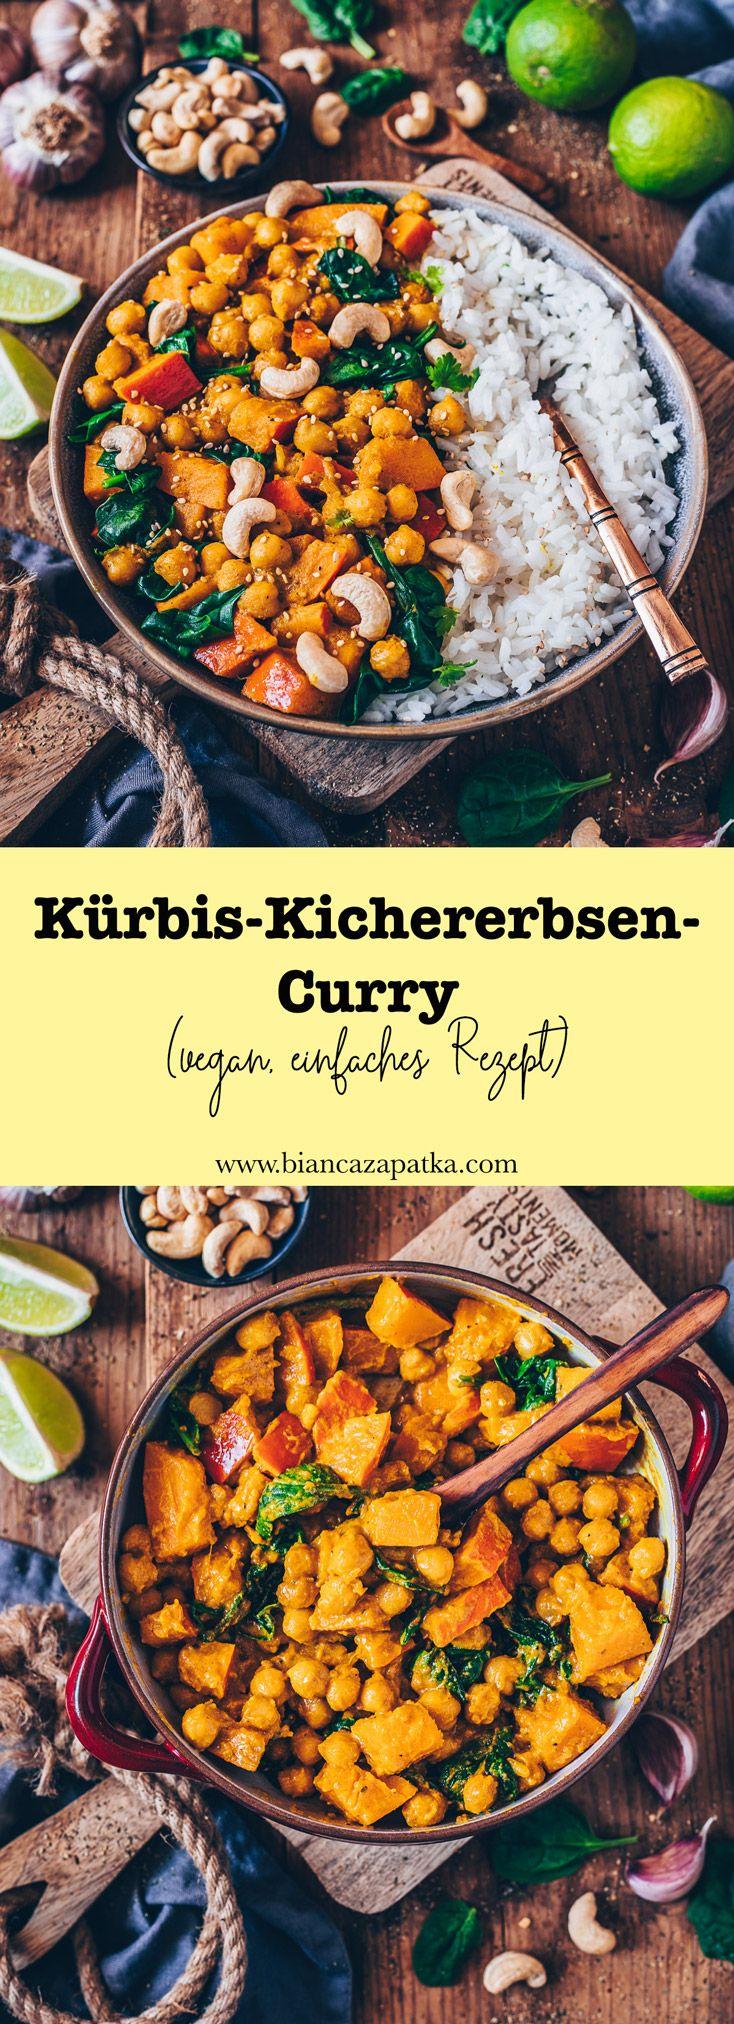 Kürbis-Kichererbsen-Curry (vegan, einfaches Rezept) - Bianca Zapatka | Rezepte